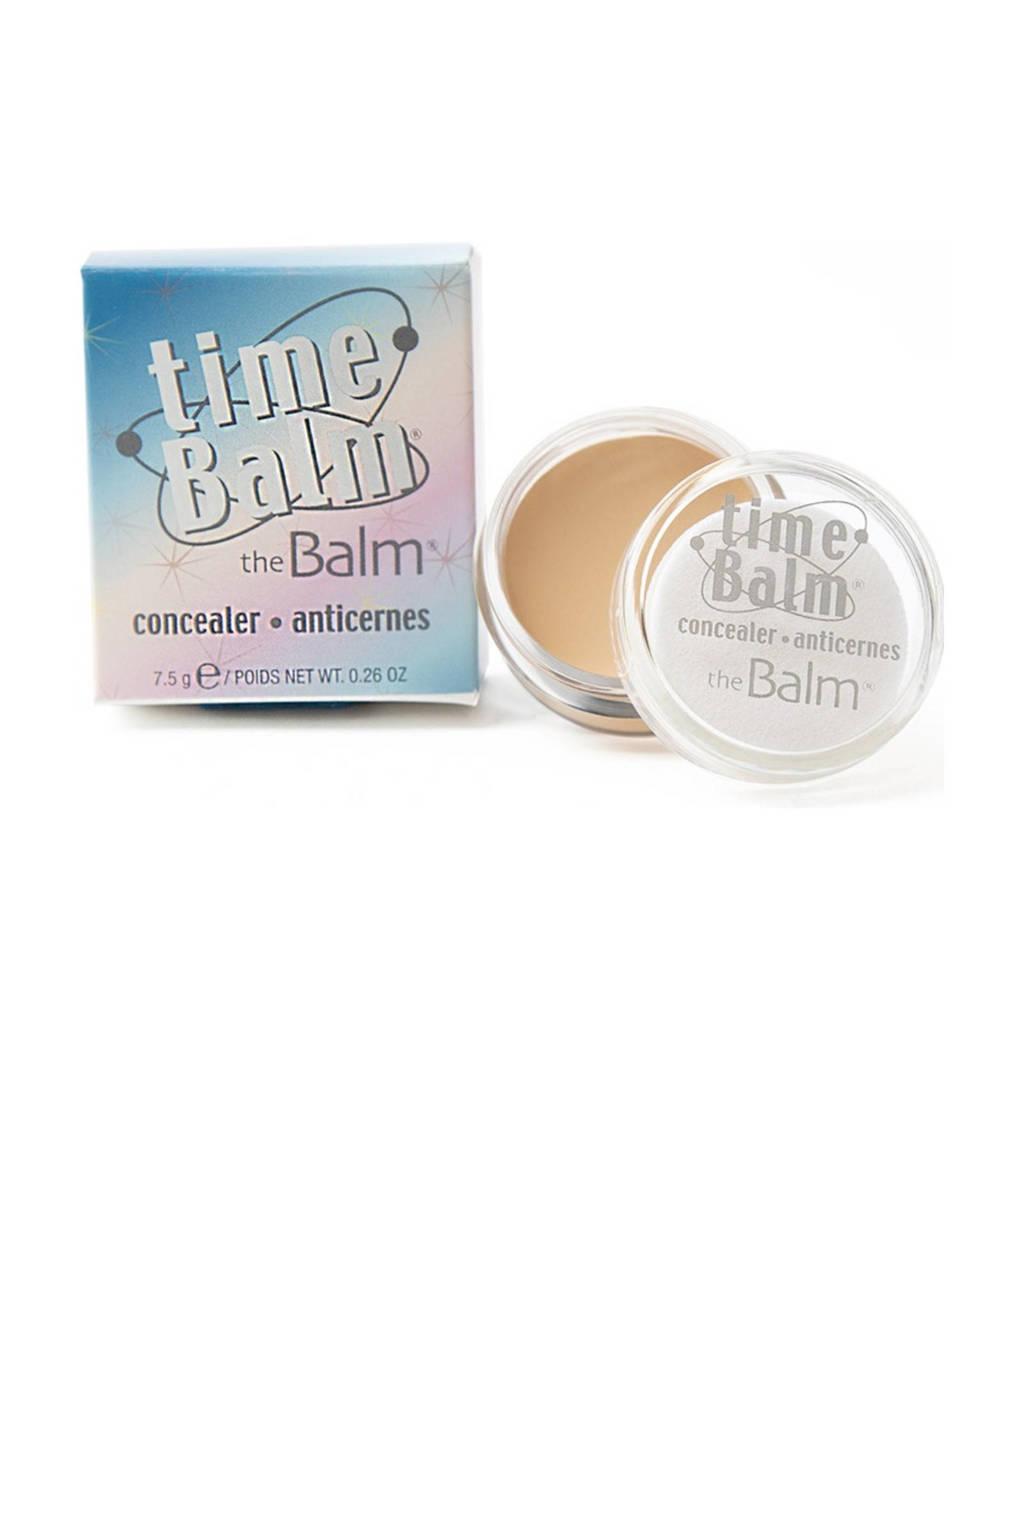 The Balm timeBalm concealer - light/medium, Light/medium